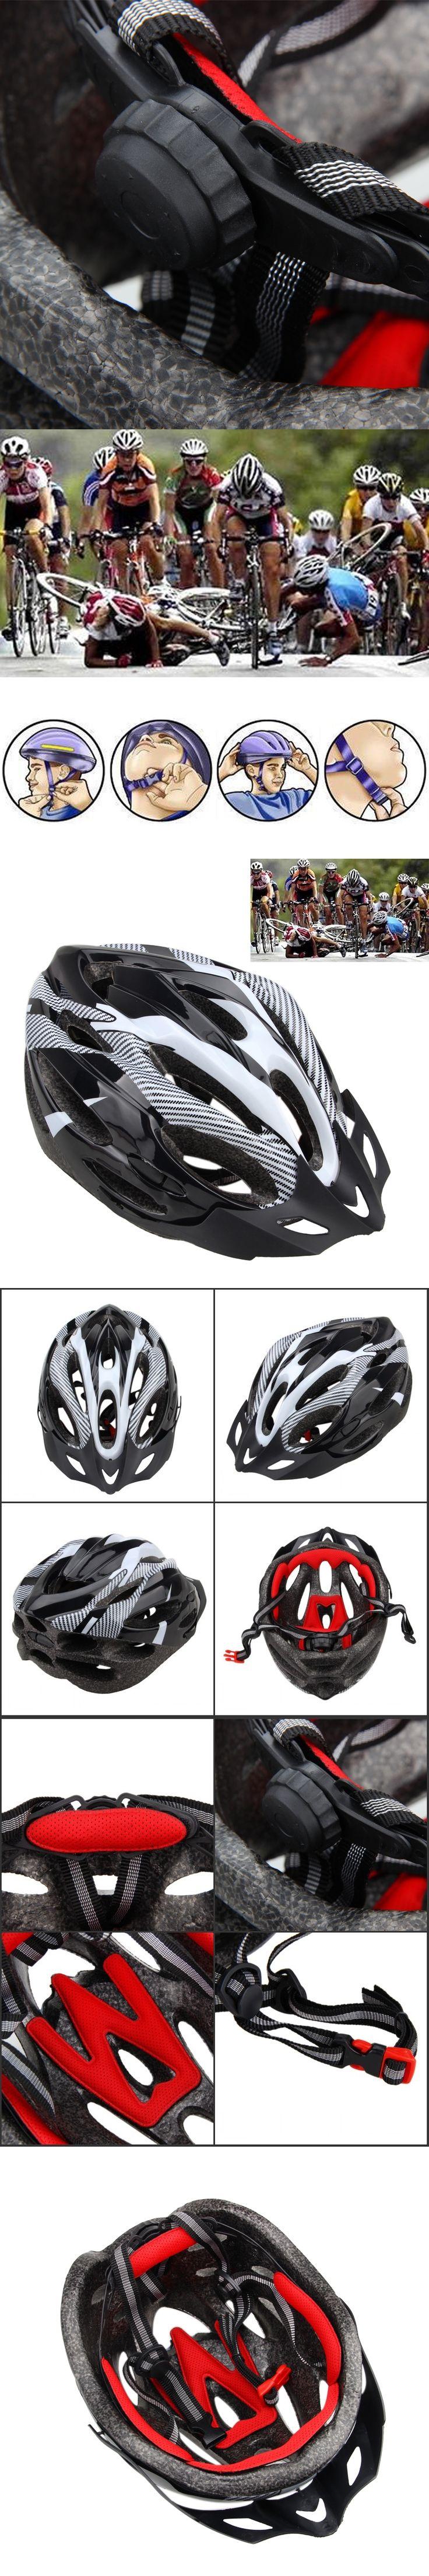 Cycling Helmet Men or Women Adjustable Bike Helmet for Mountain and Road Bicycle Helmet